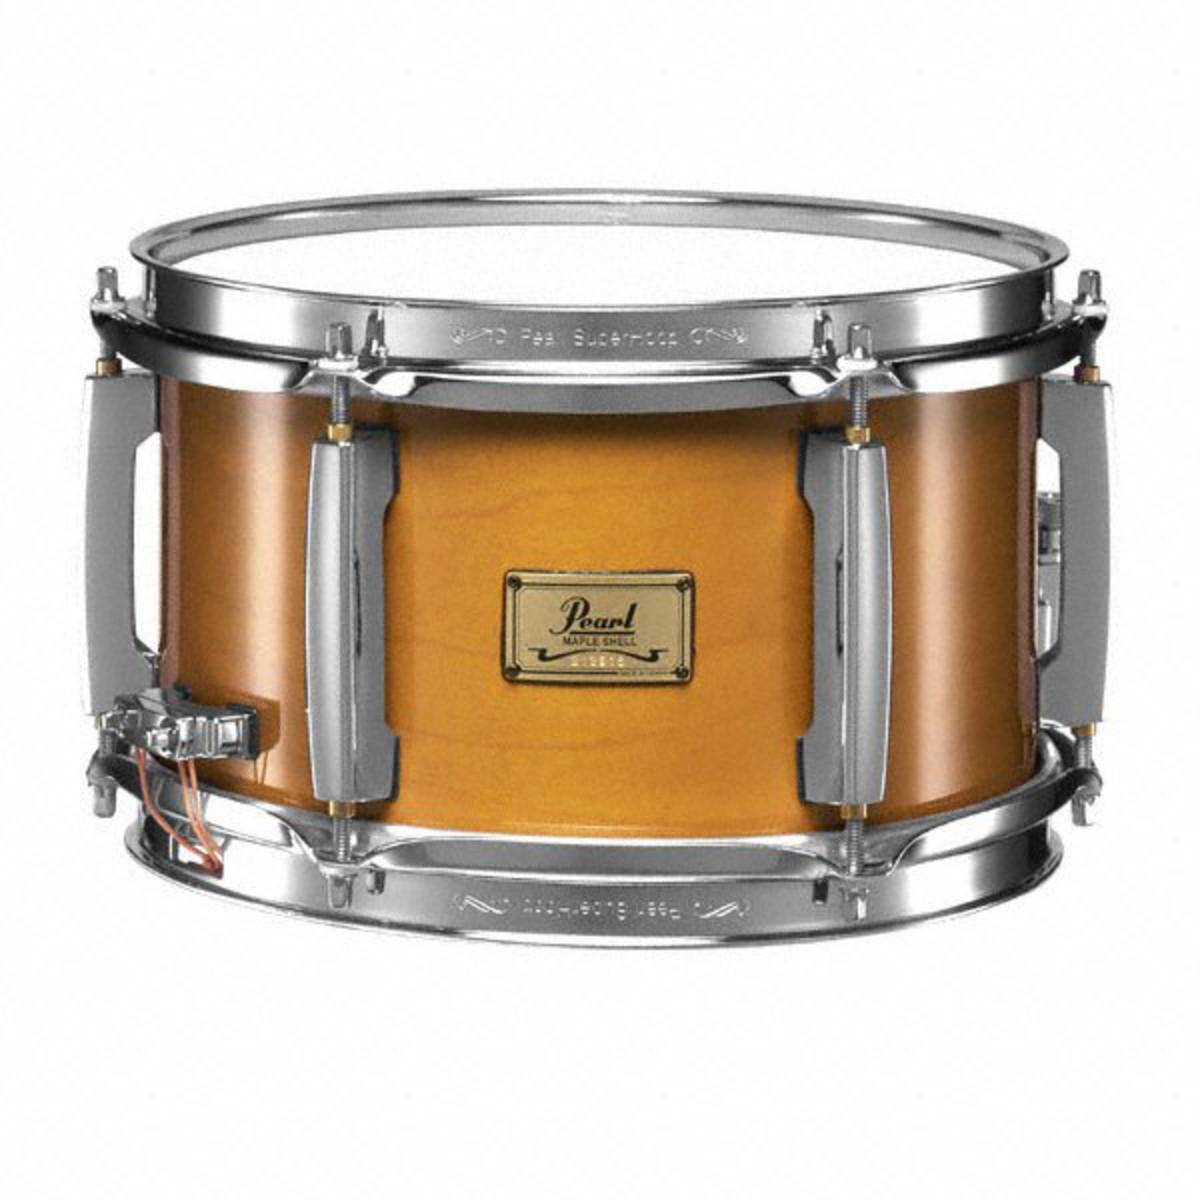 offline pearl m1060 popcorn snare drum 10x6 at gear4music. Black Bedroom Furniture Sets. Home Design Ideas